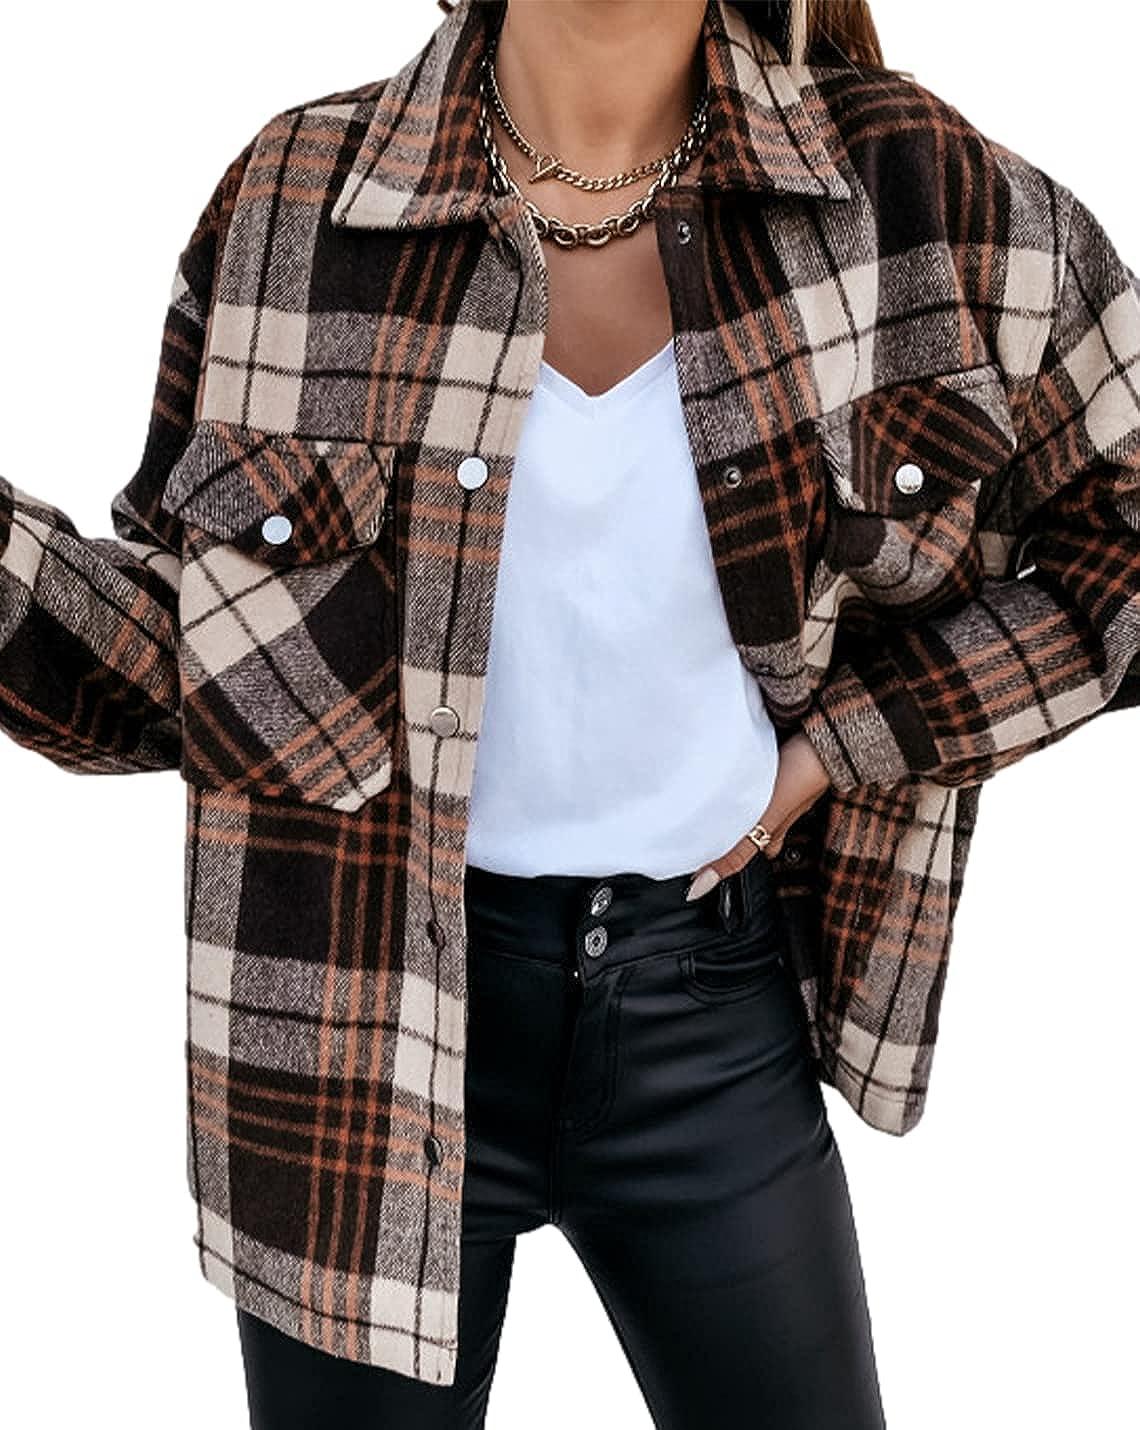 Peaceglad Women's Lapel cheap Long Sleeve Shirt Casual Sn Jacket Trust Plaid